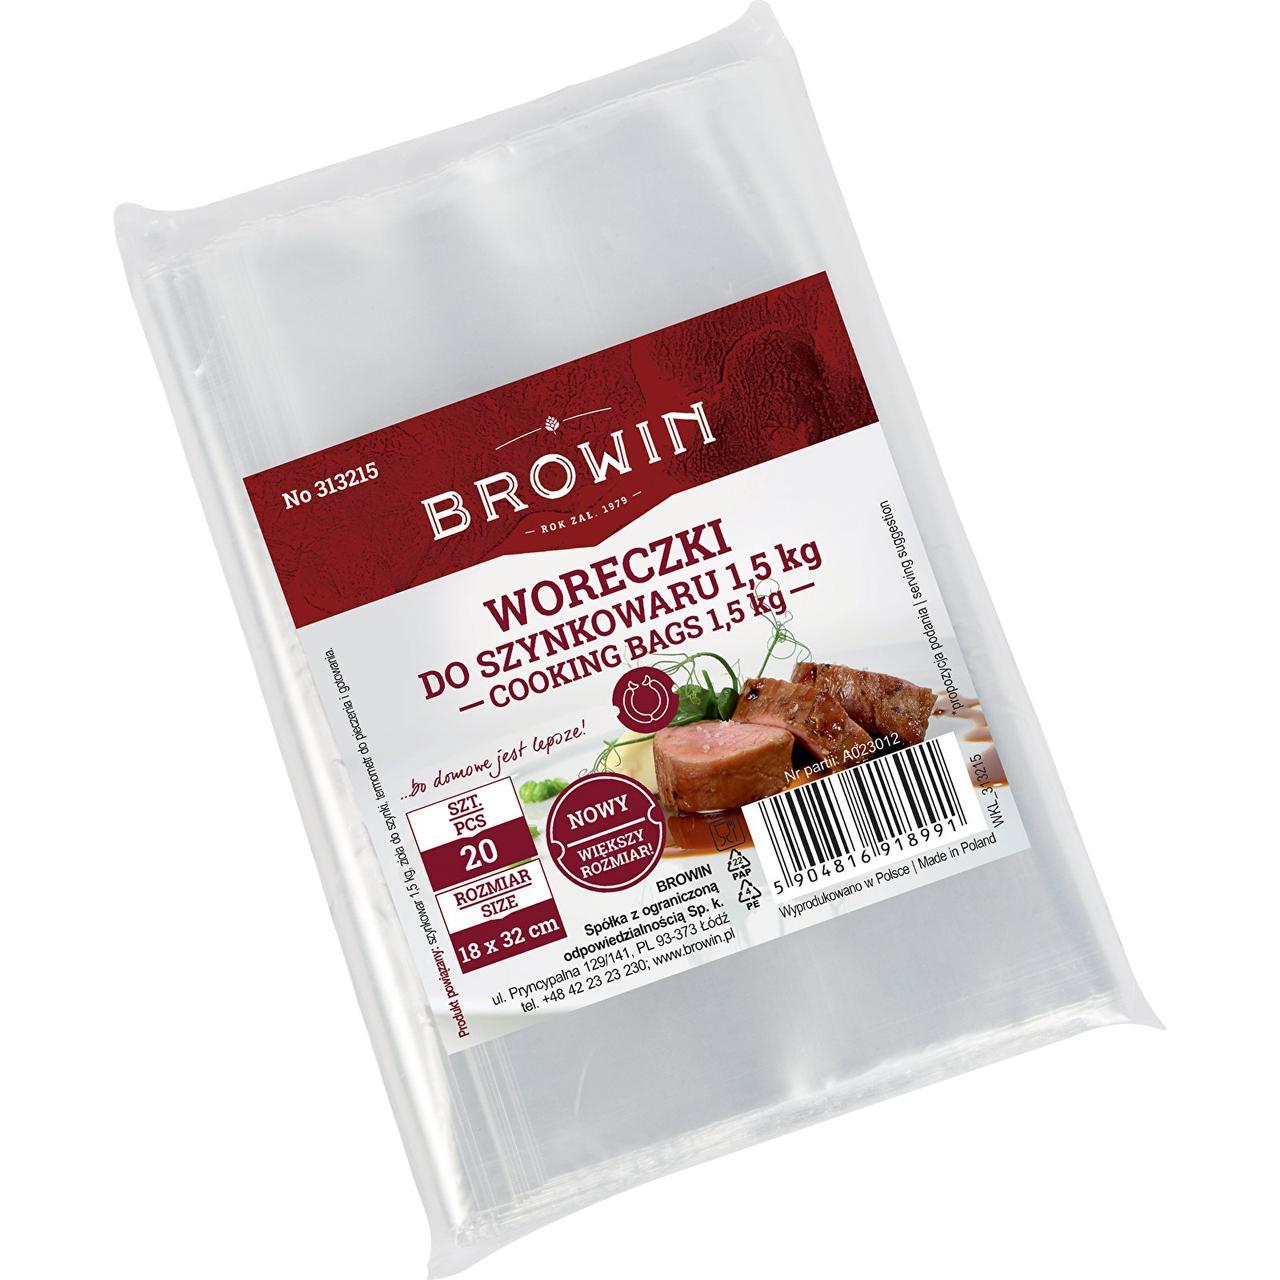 Набор пакетов для ветчинниц Browin 1,5 кг  20 шт (313215)